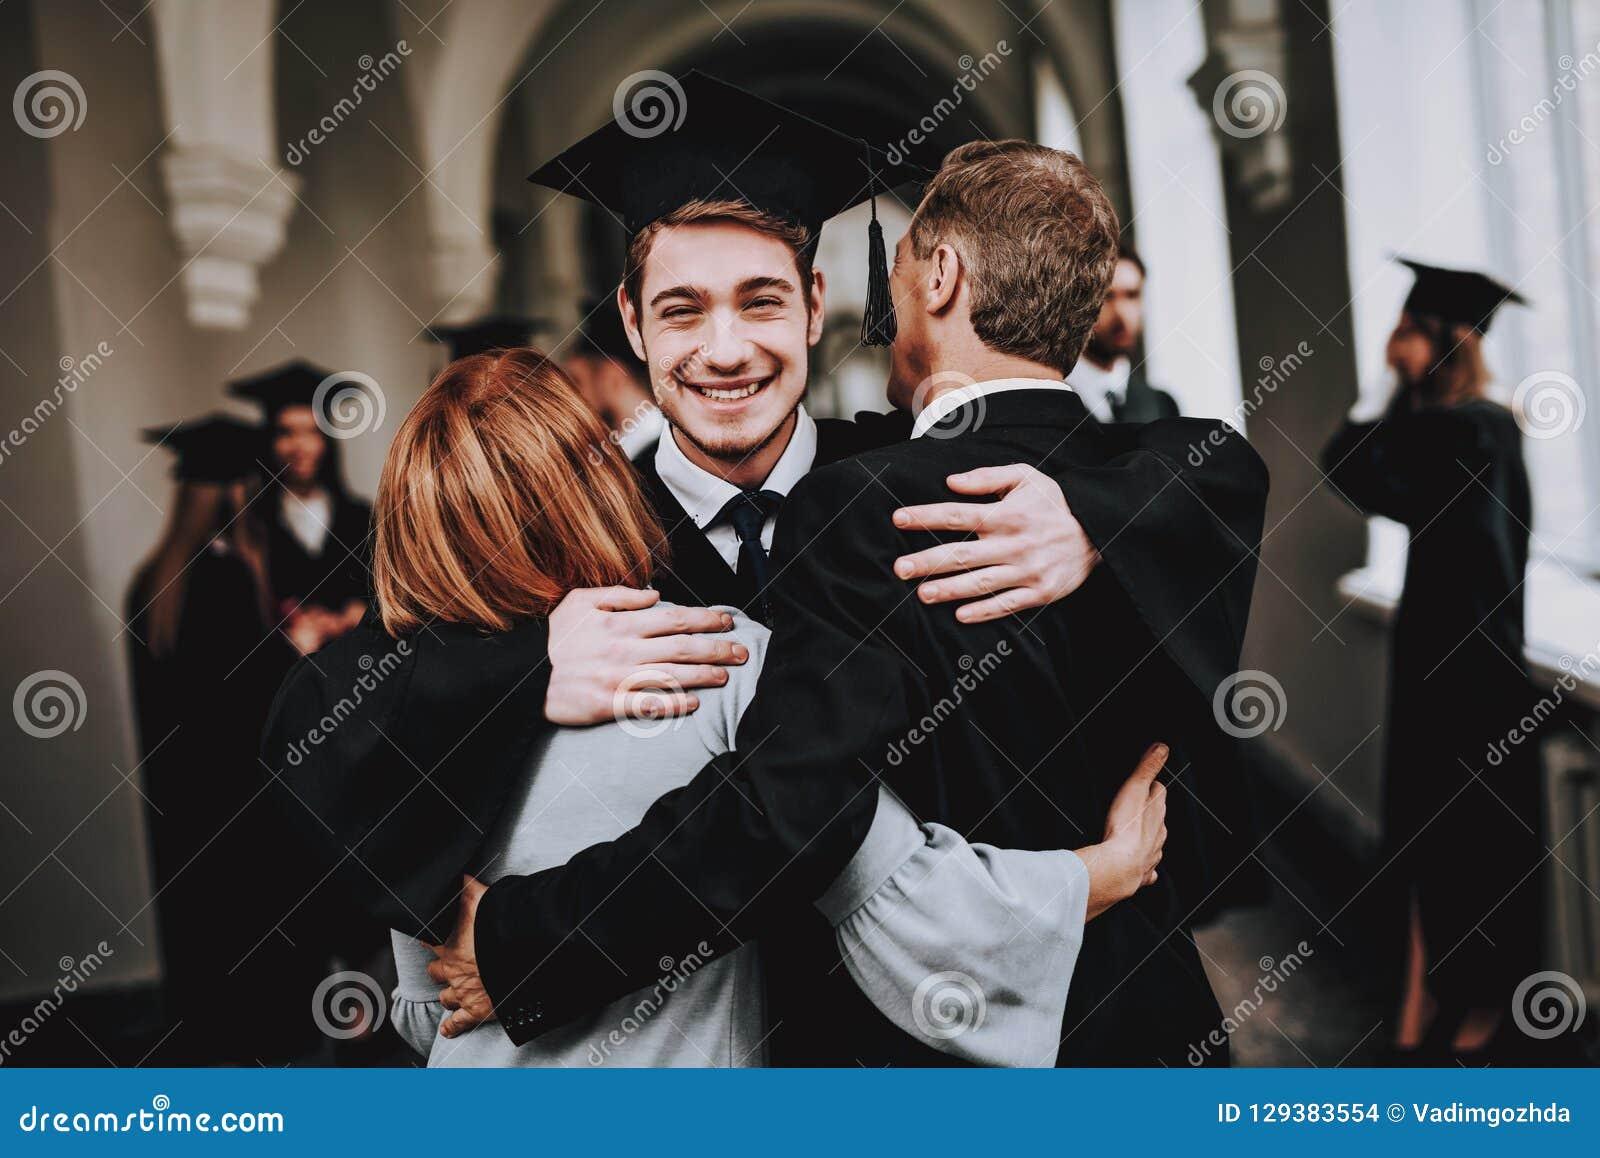 Mother. Father. Son. Hugs. University. Graduates.